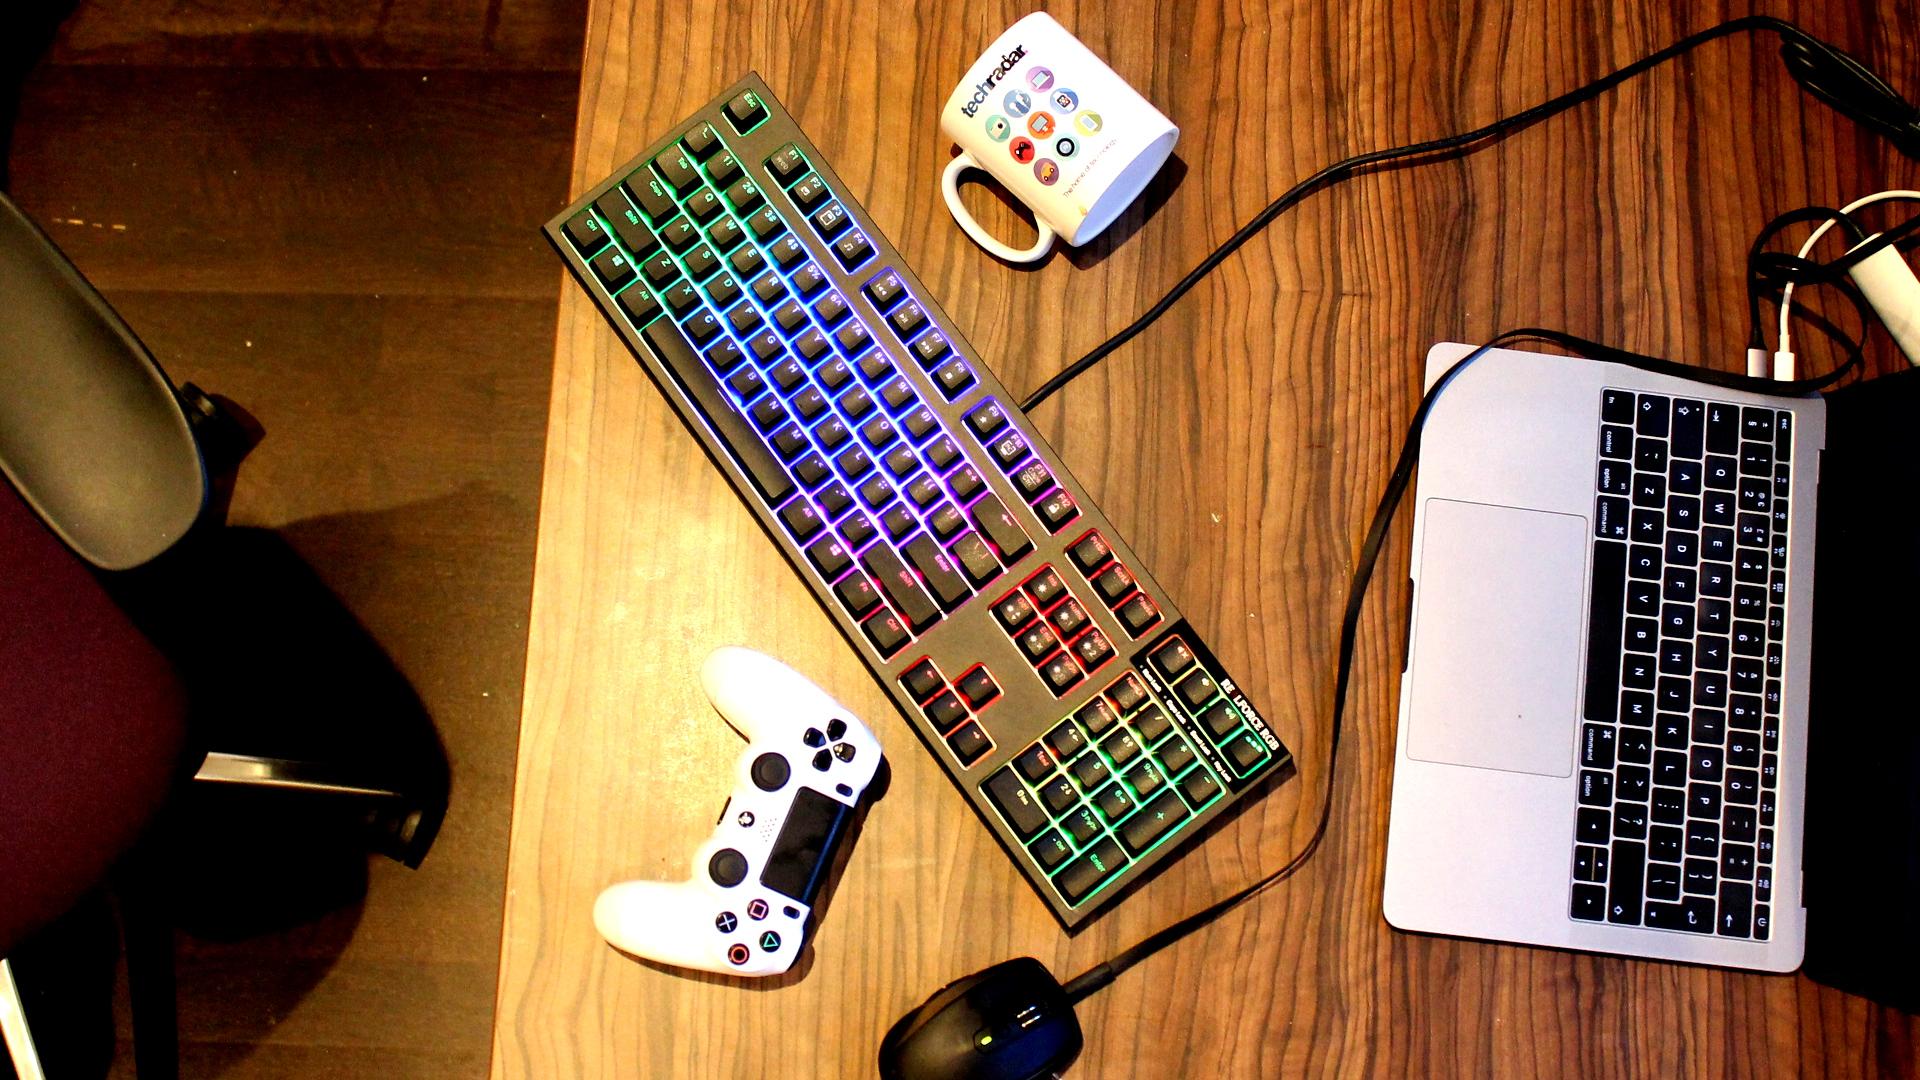 Best gaming keyboard 2019: the best gaming keyboards we've tested